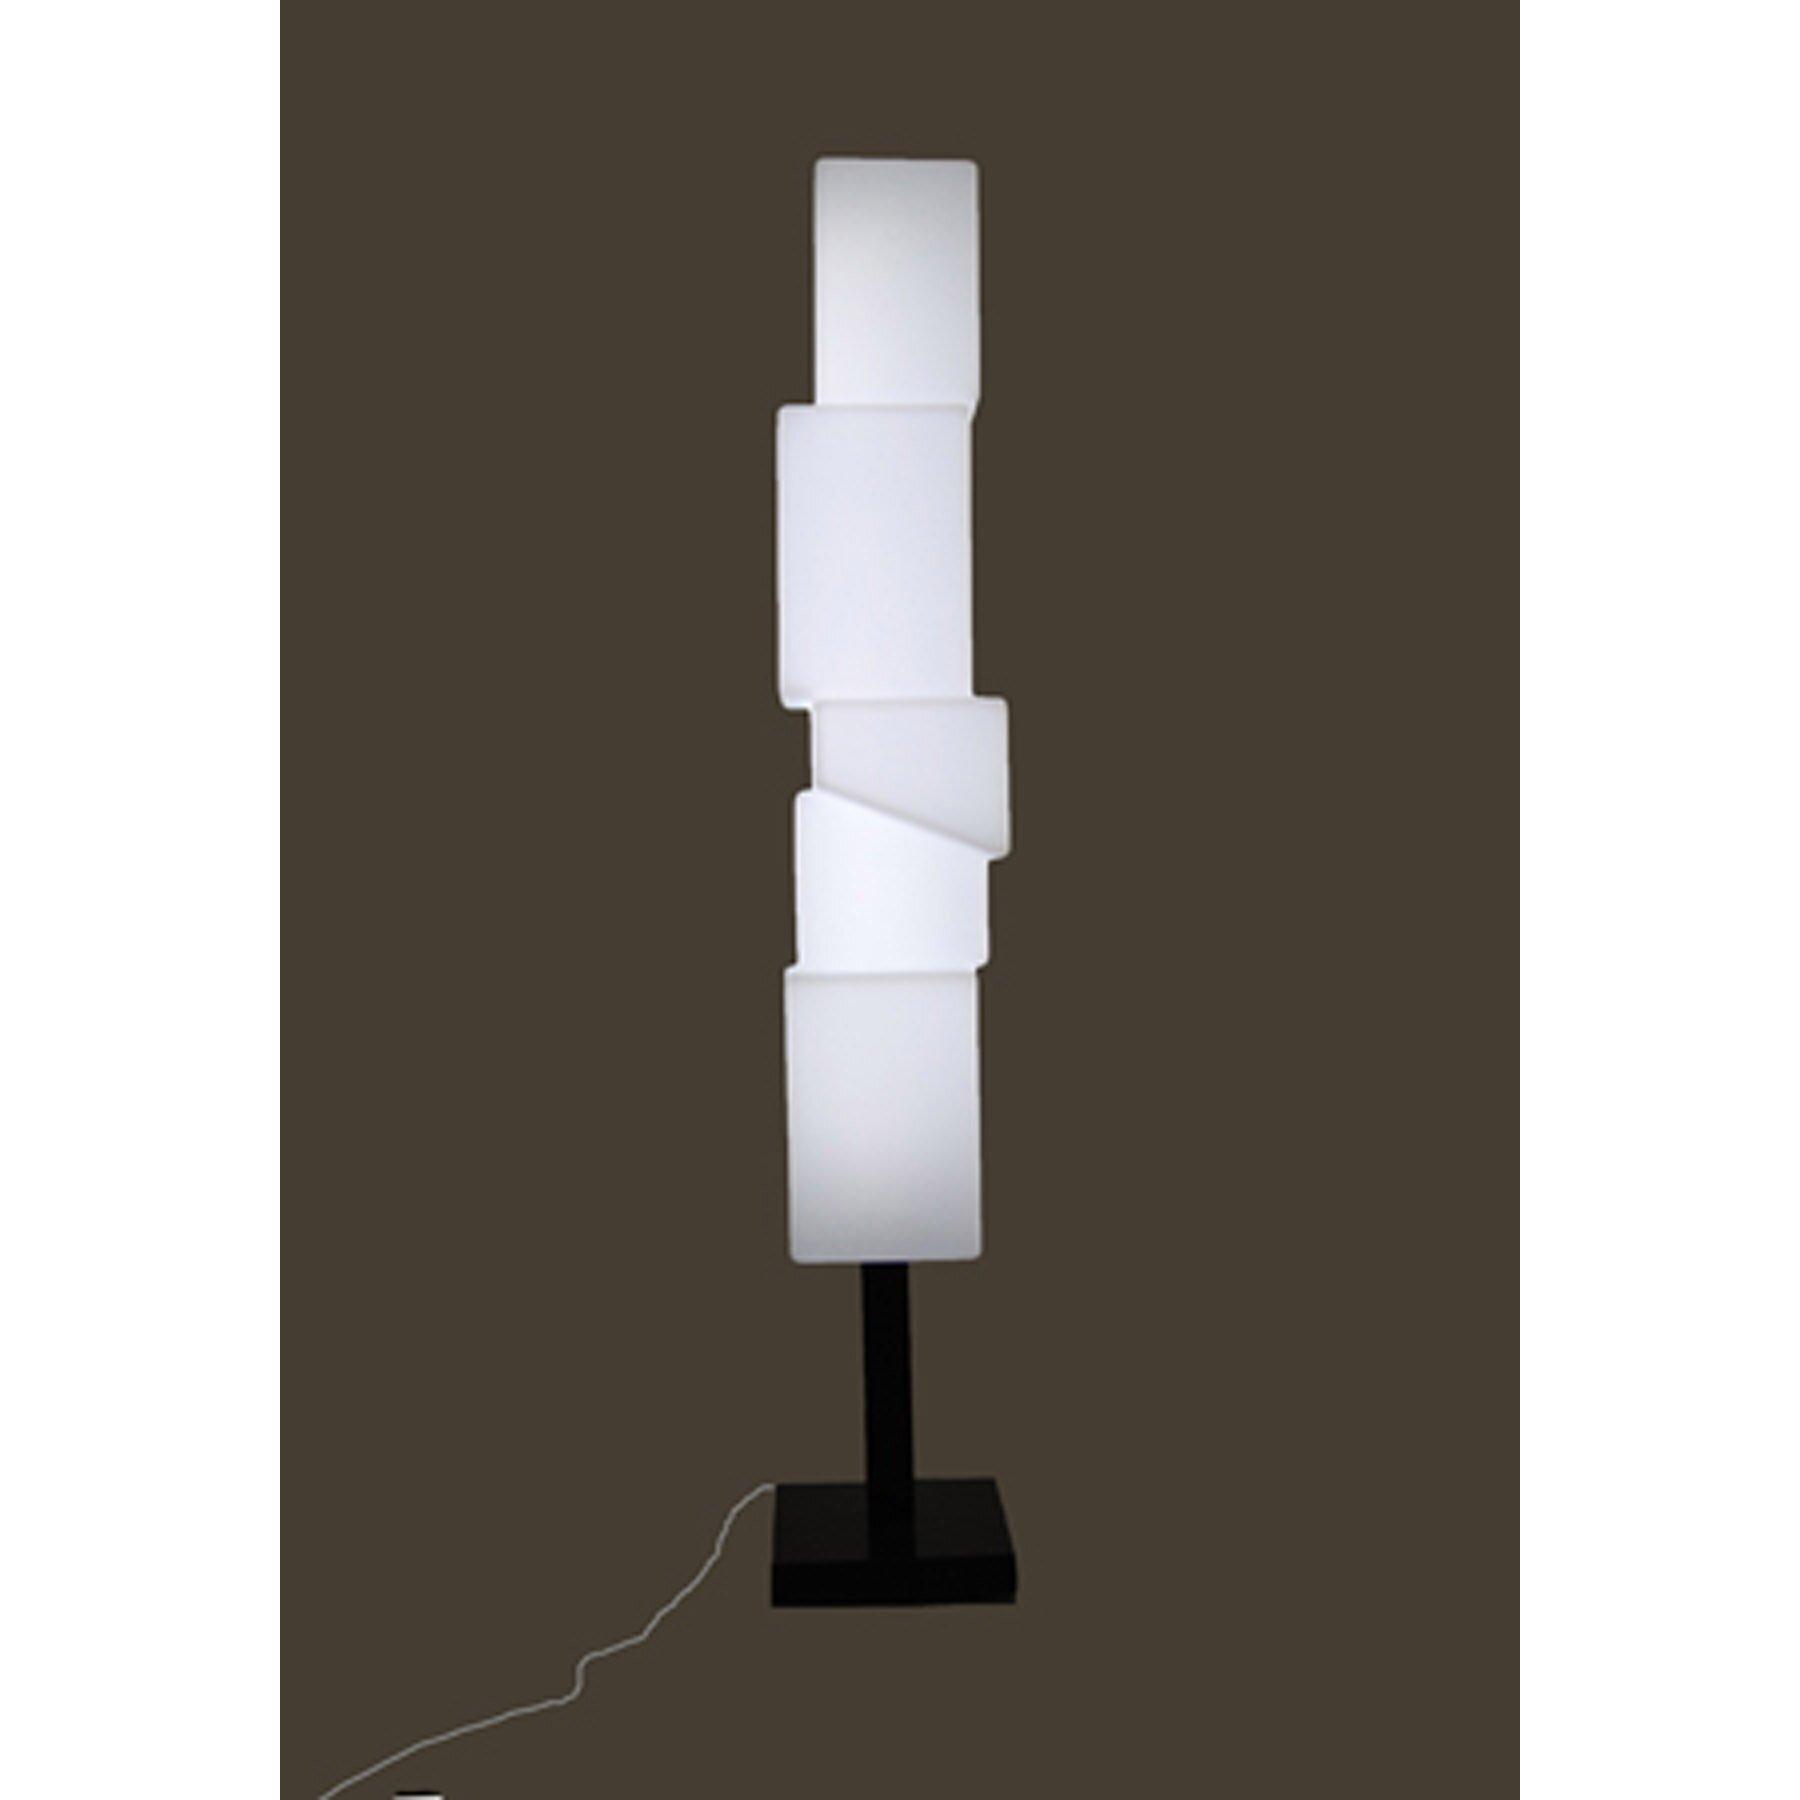 100 essentials moment d 5787quot floor lamp reviews wayfair With moment d floor lamp